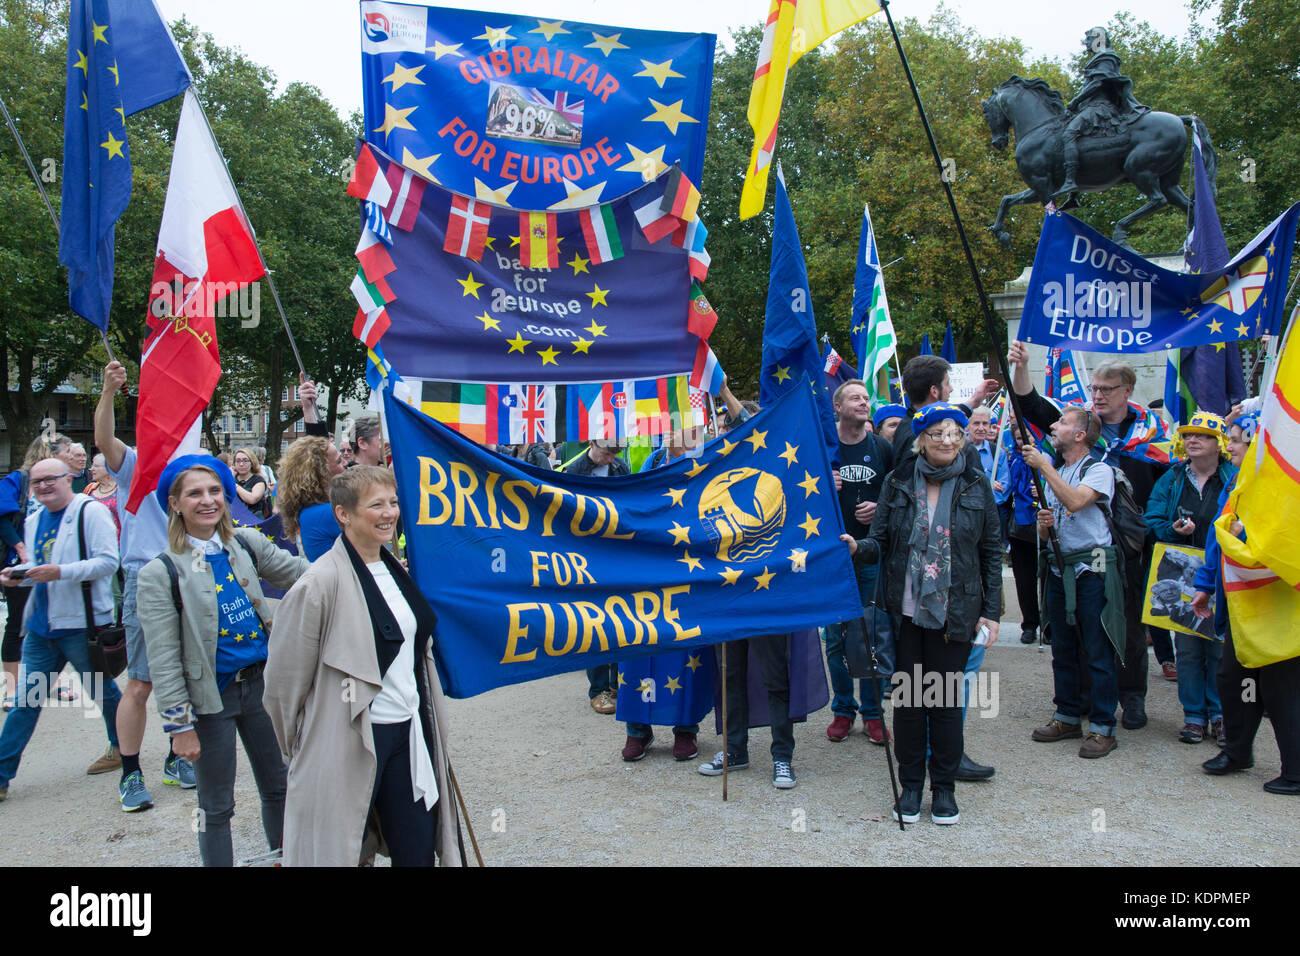 Bristol, UK, 14. Oktober 2017. Julie girling, konservative Europaabgeordnete für South West und Gibraltar pro Stockbild